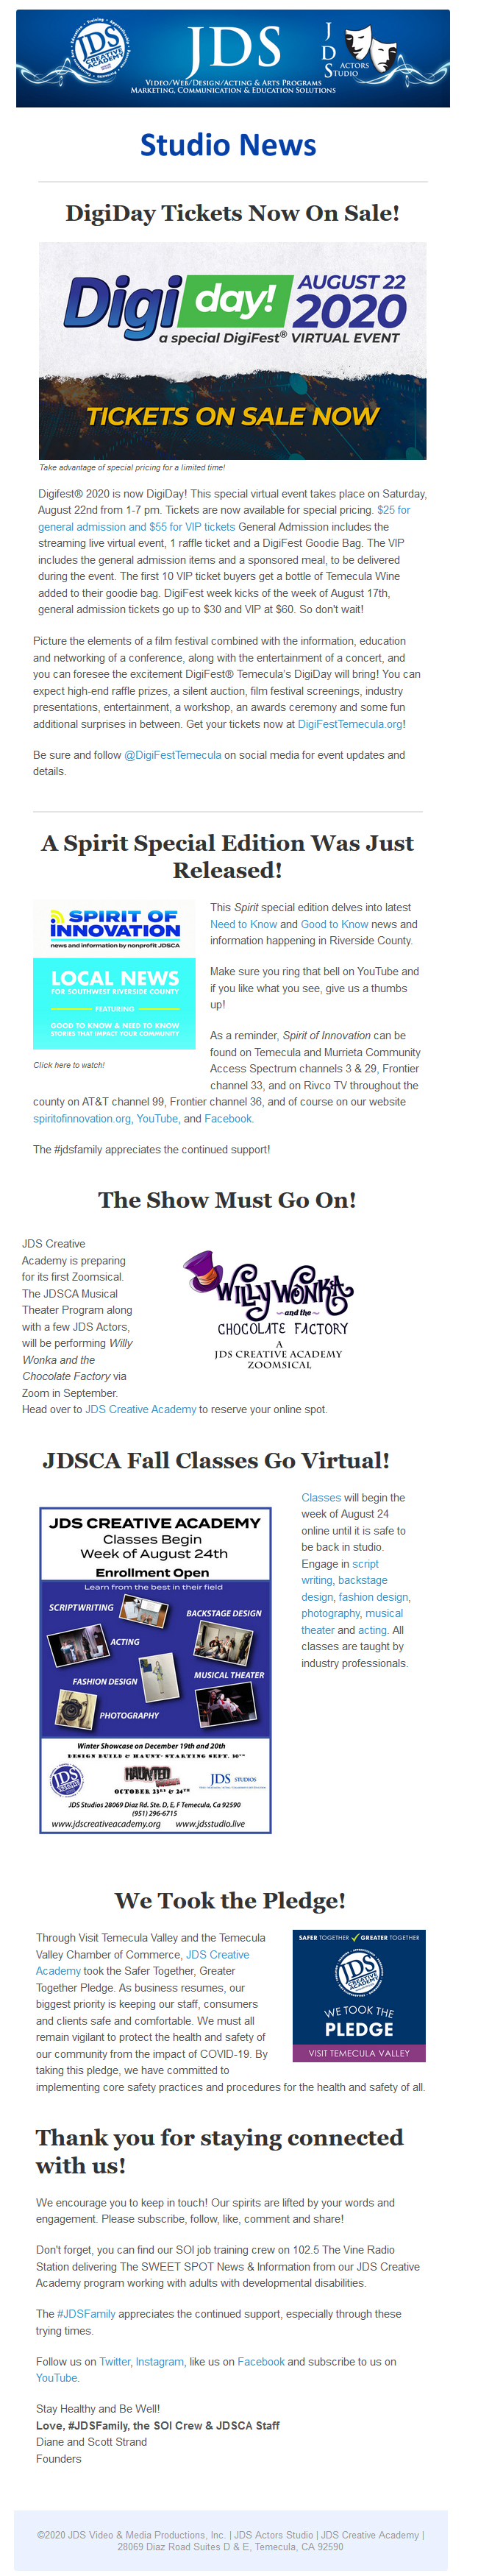 JDS Studio July Good to Know News